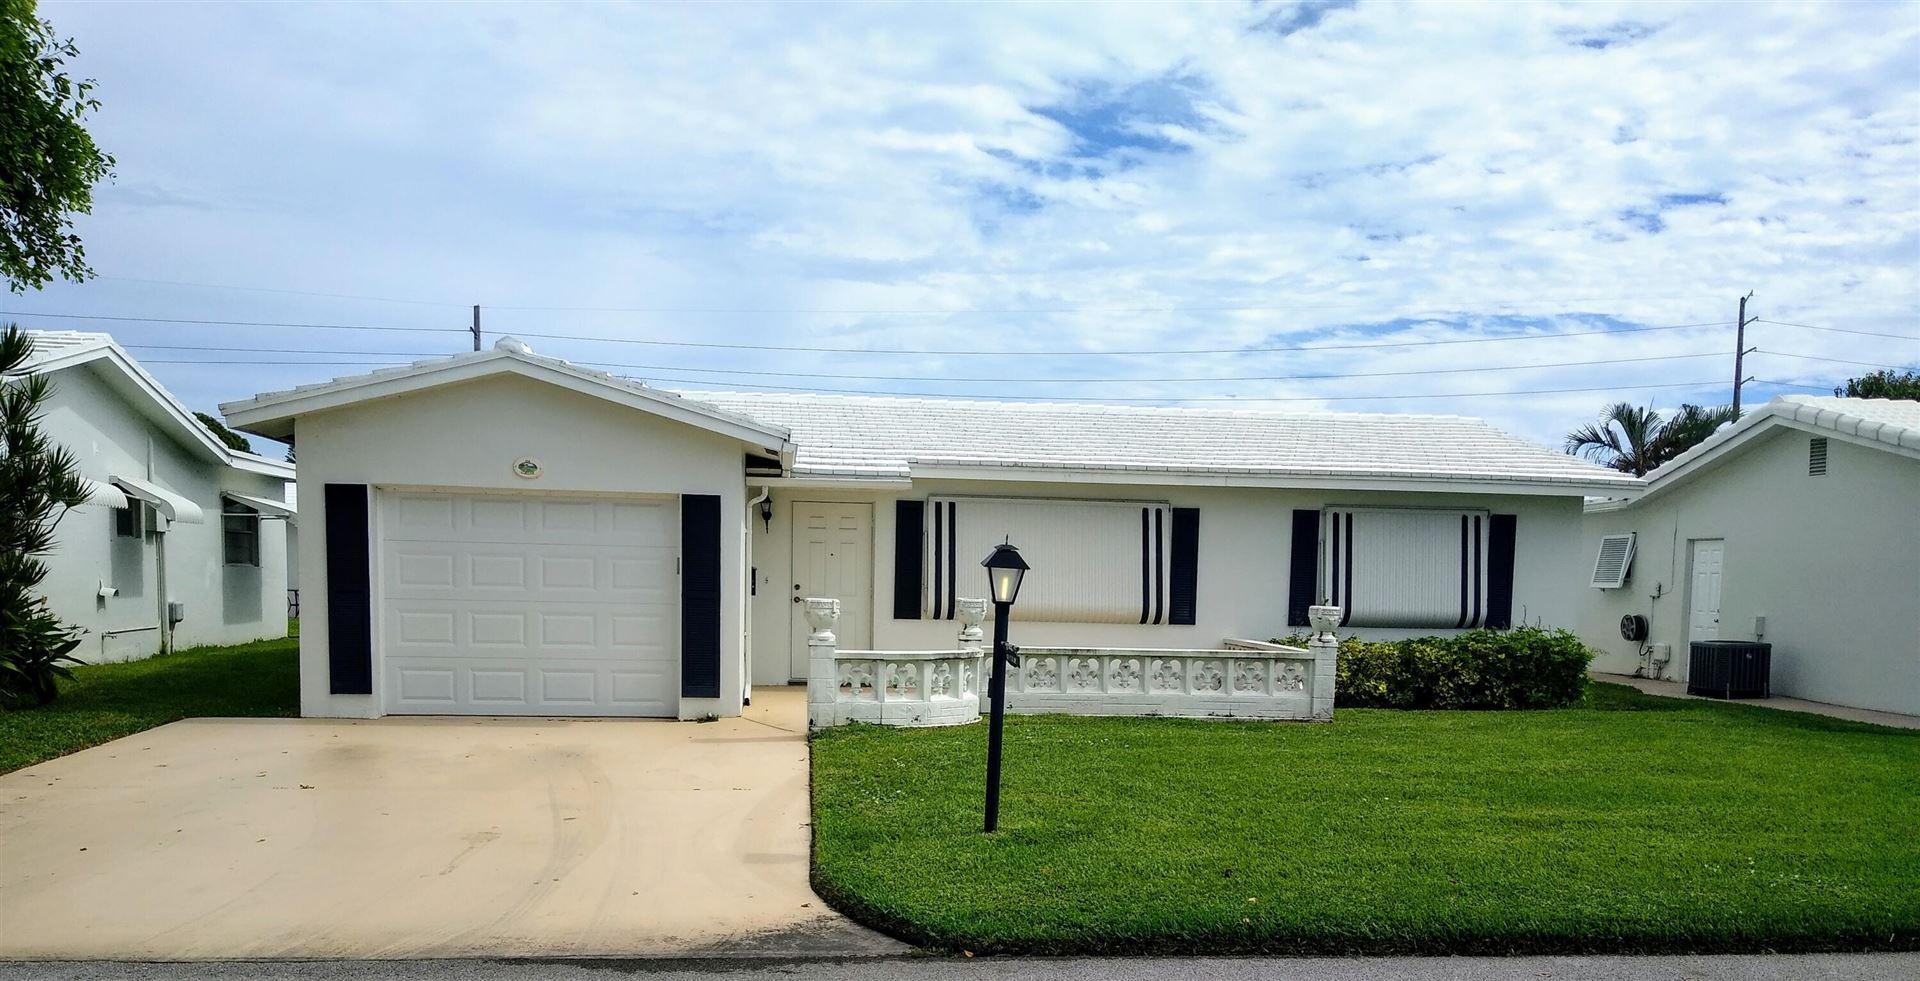 Photo of 114 SW 8th Court, Boynton Beach, FL 33426 (MLS # RX-10753822)